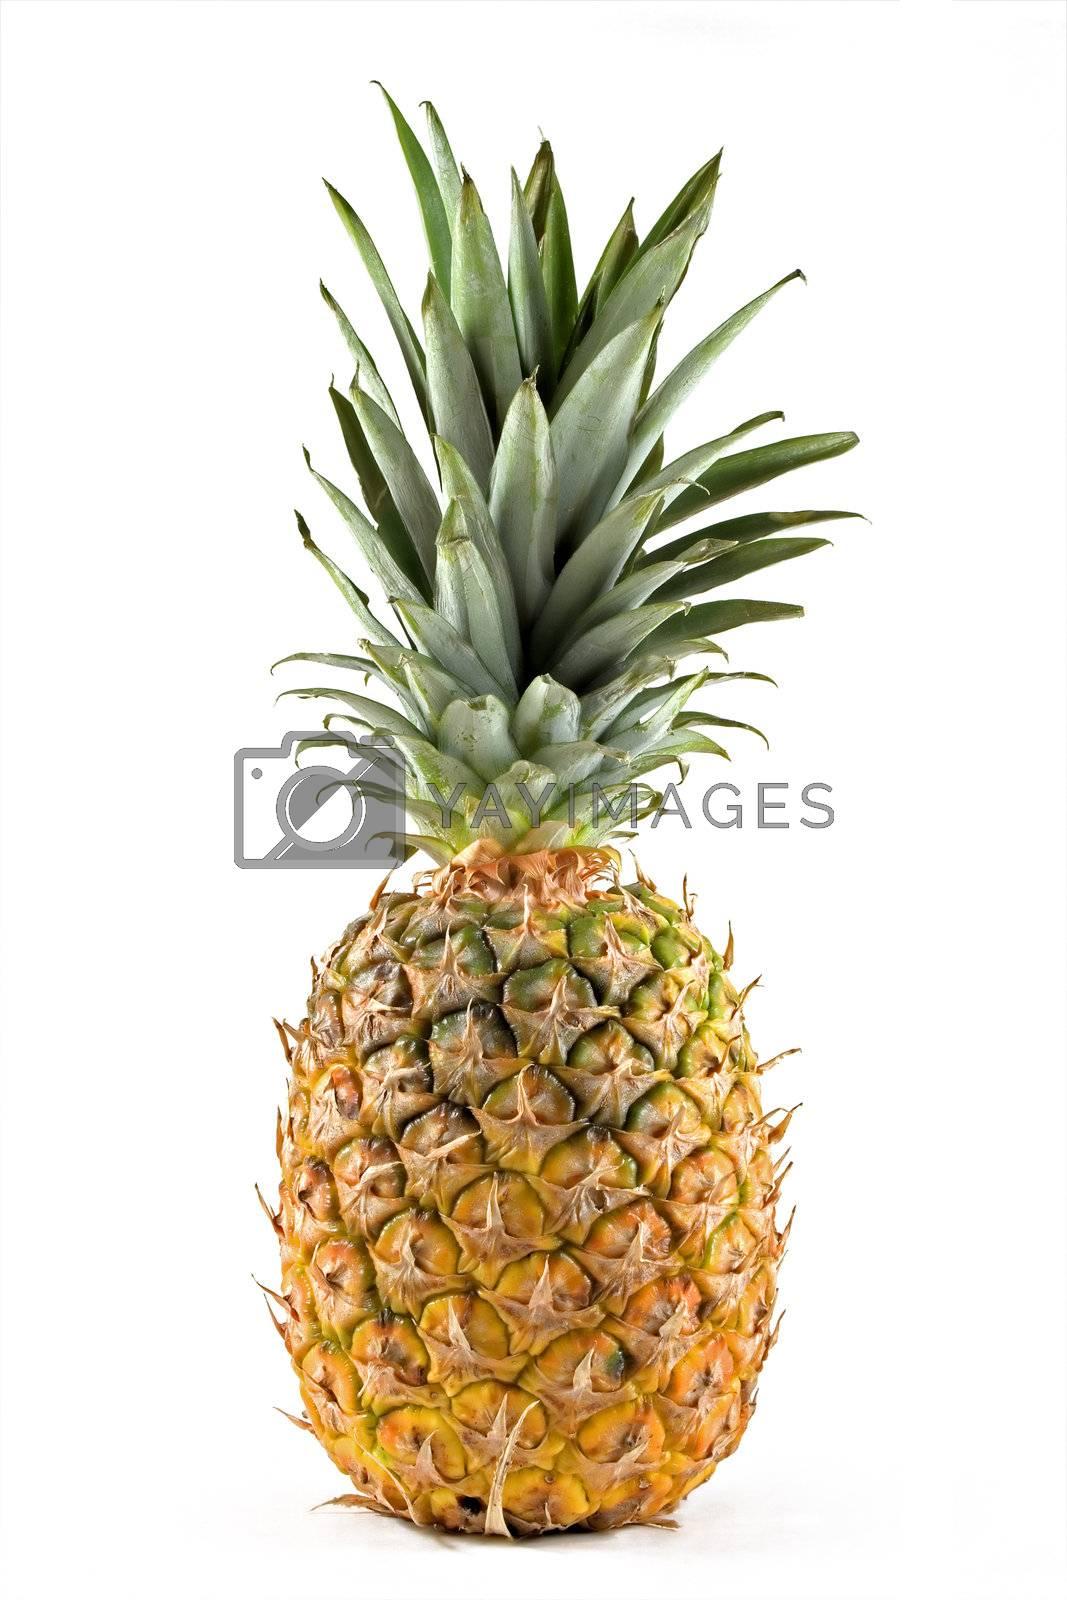 Pineapple by PauloResende